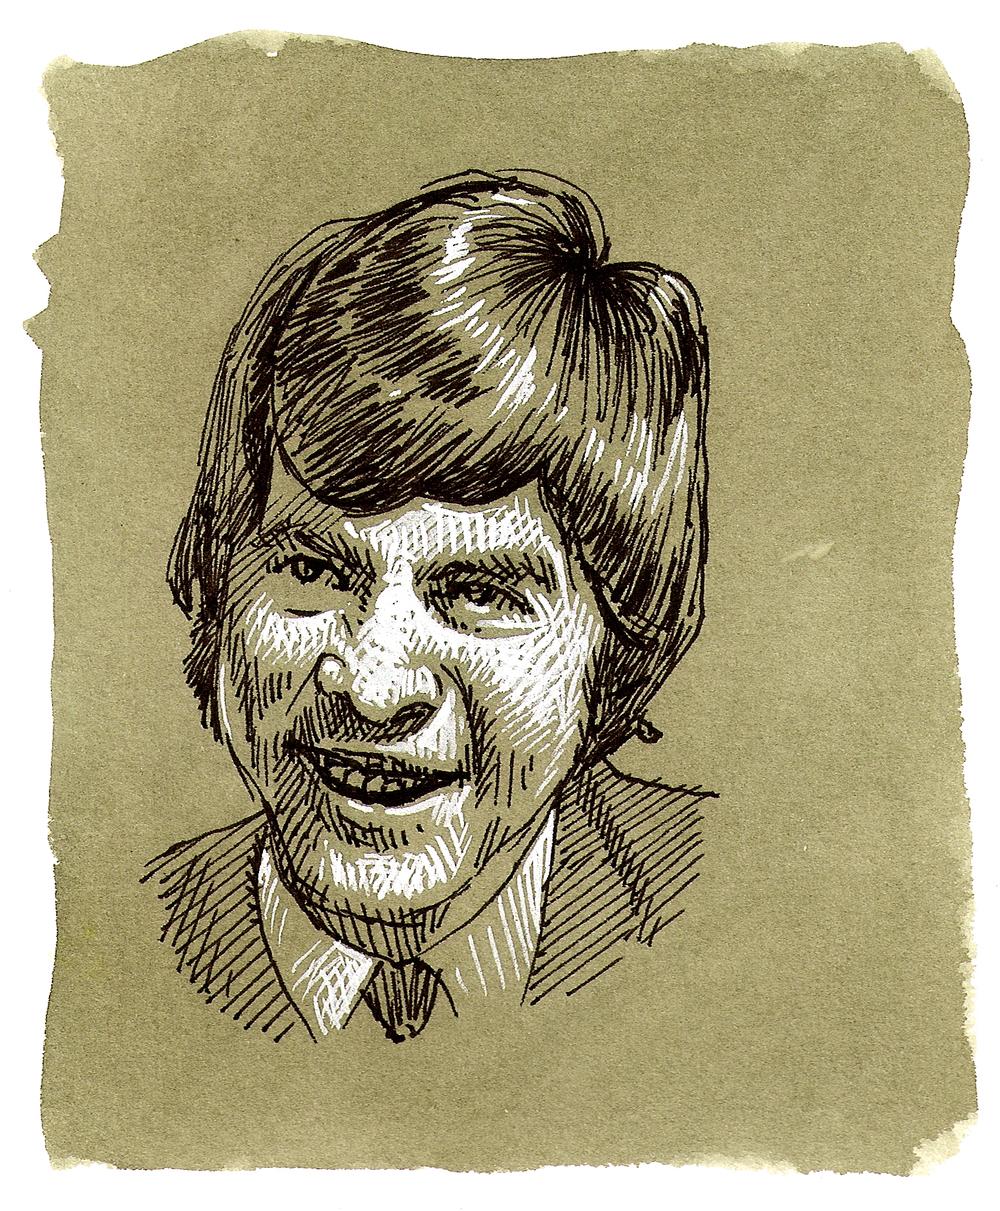 '1970's man ll'